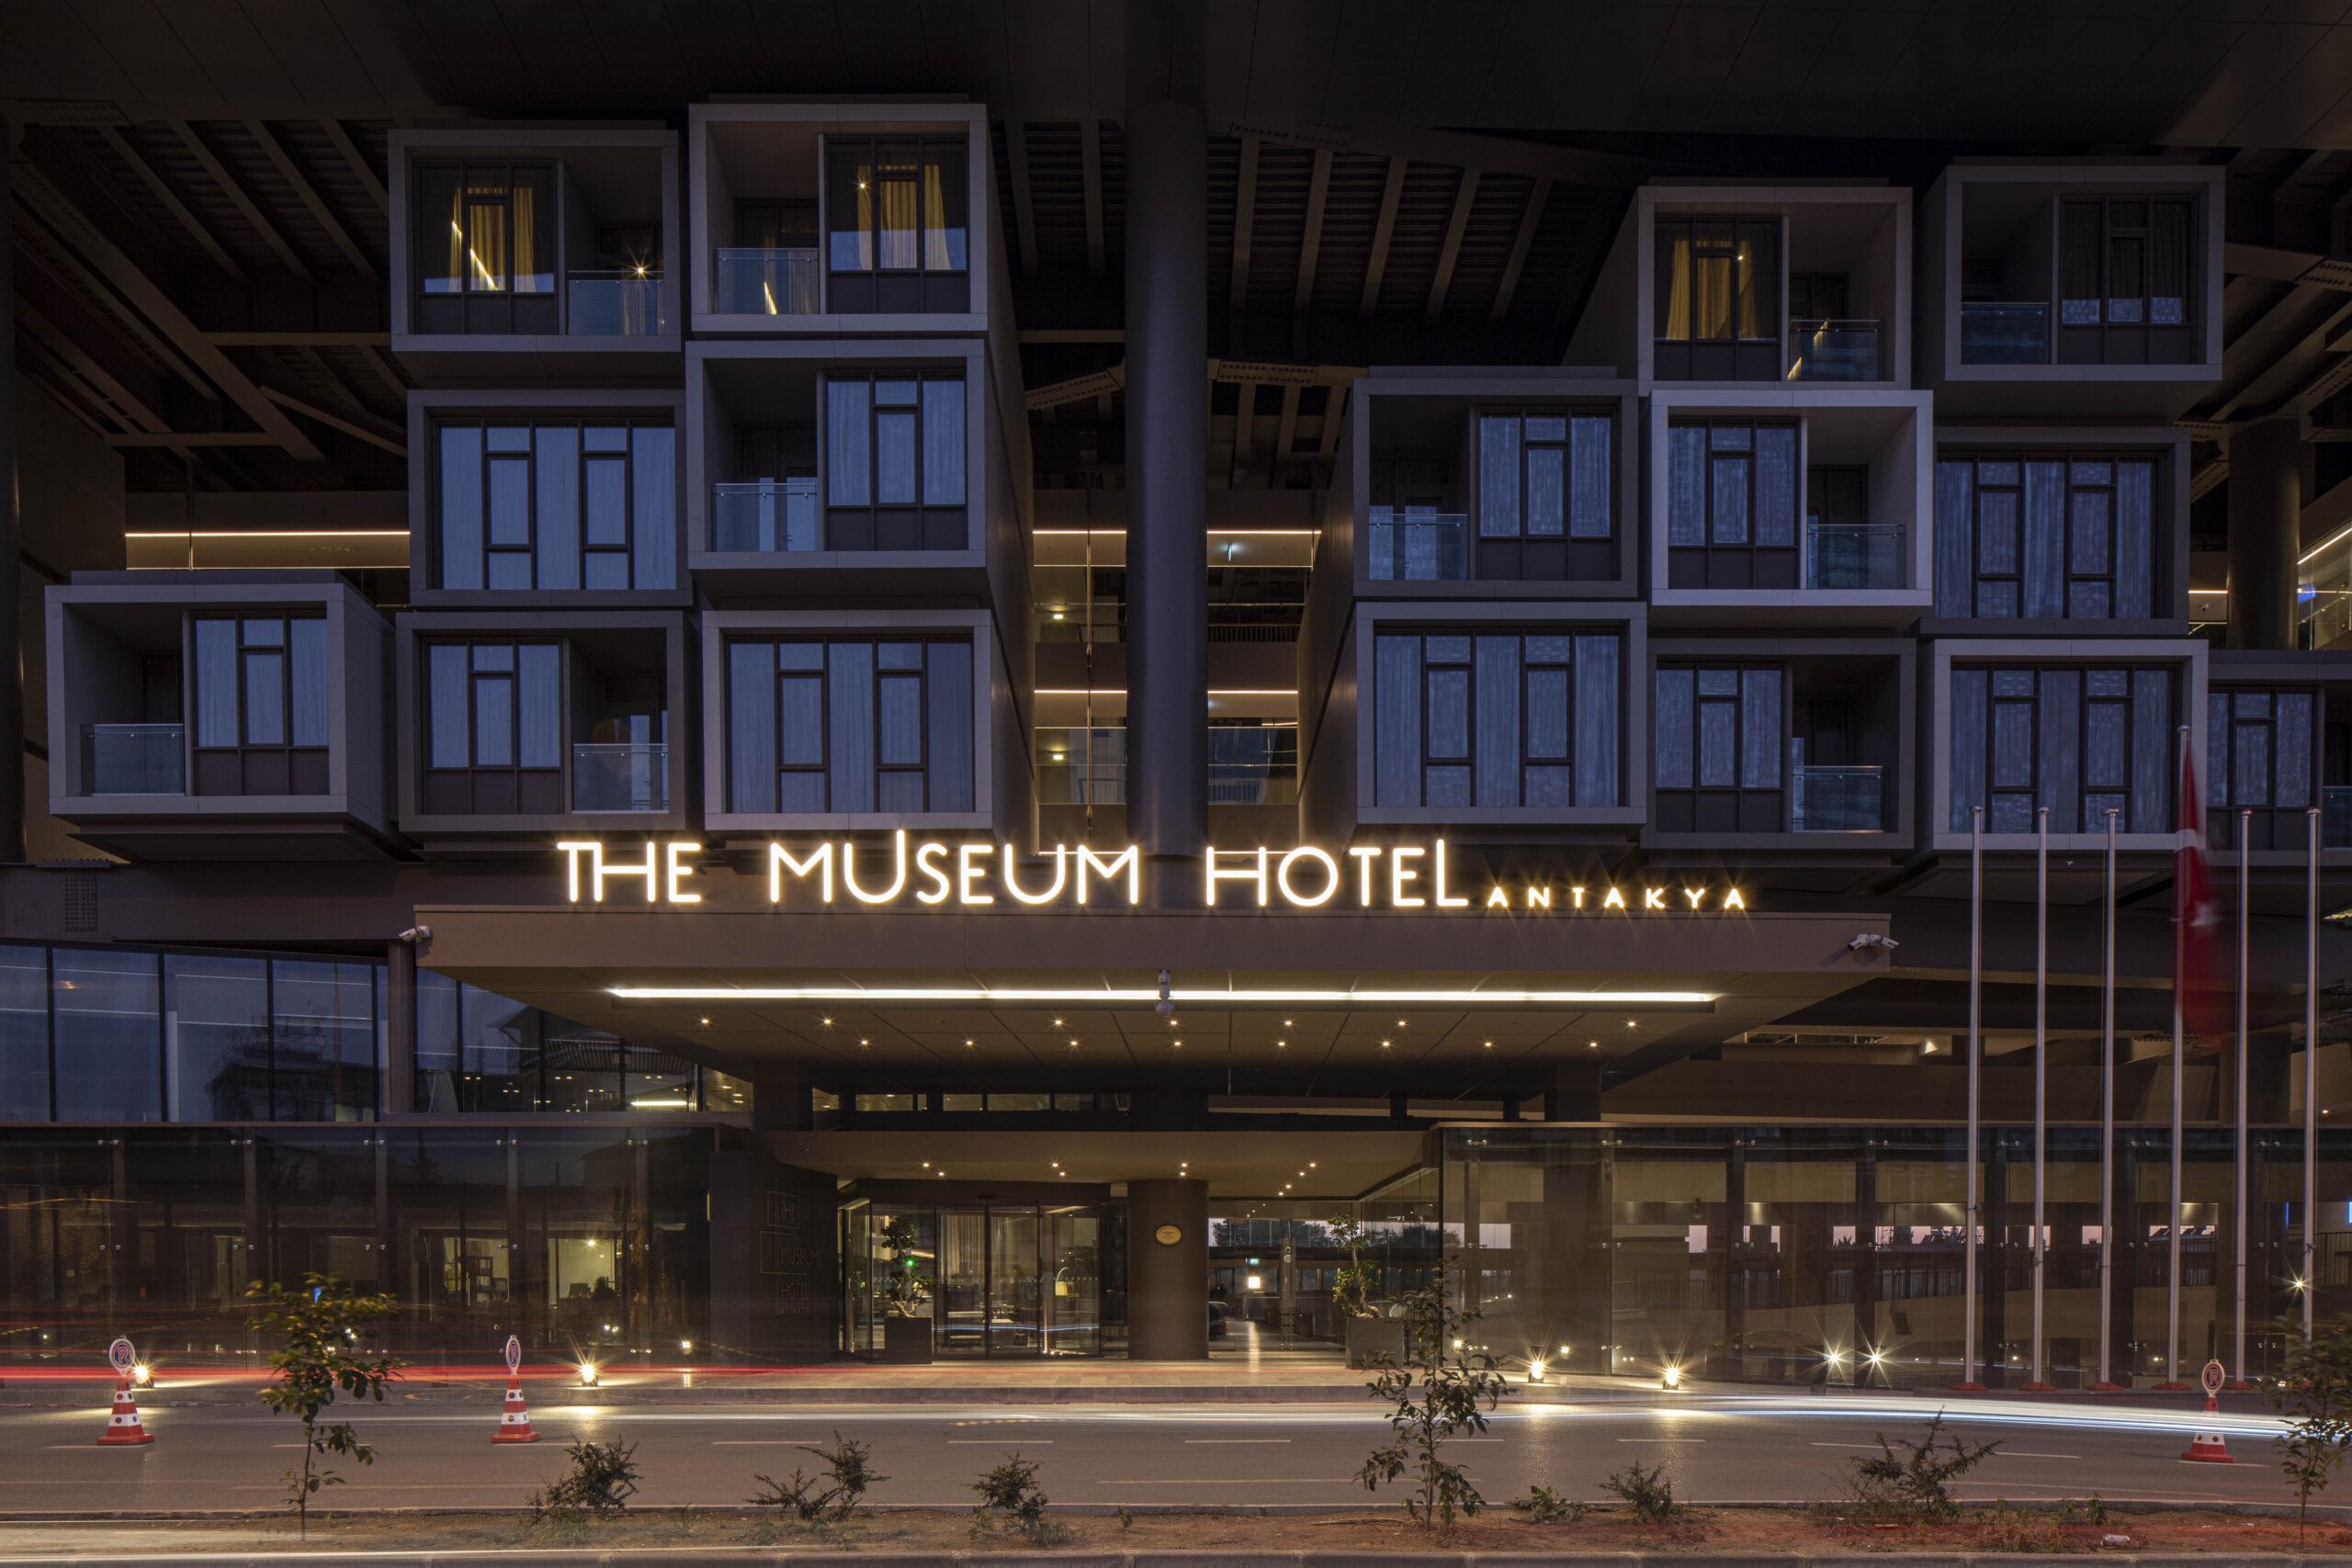 The Museum Hotel Antakya, Turkey